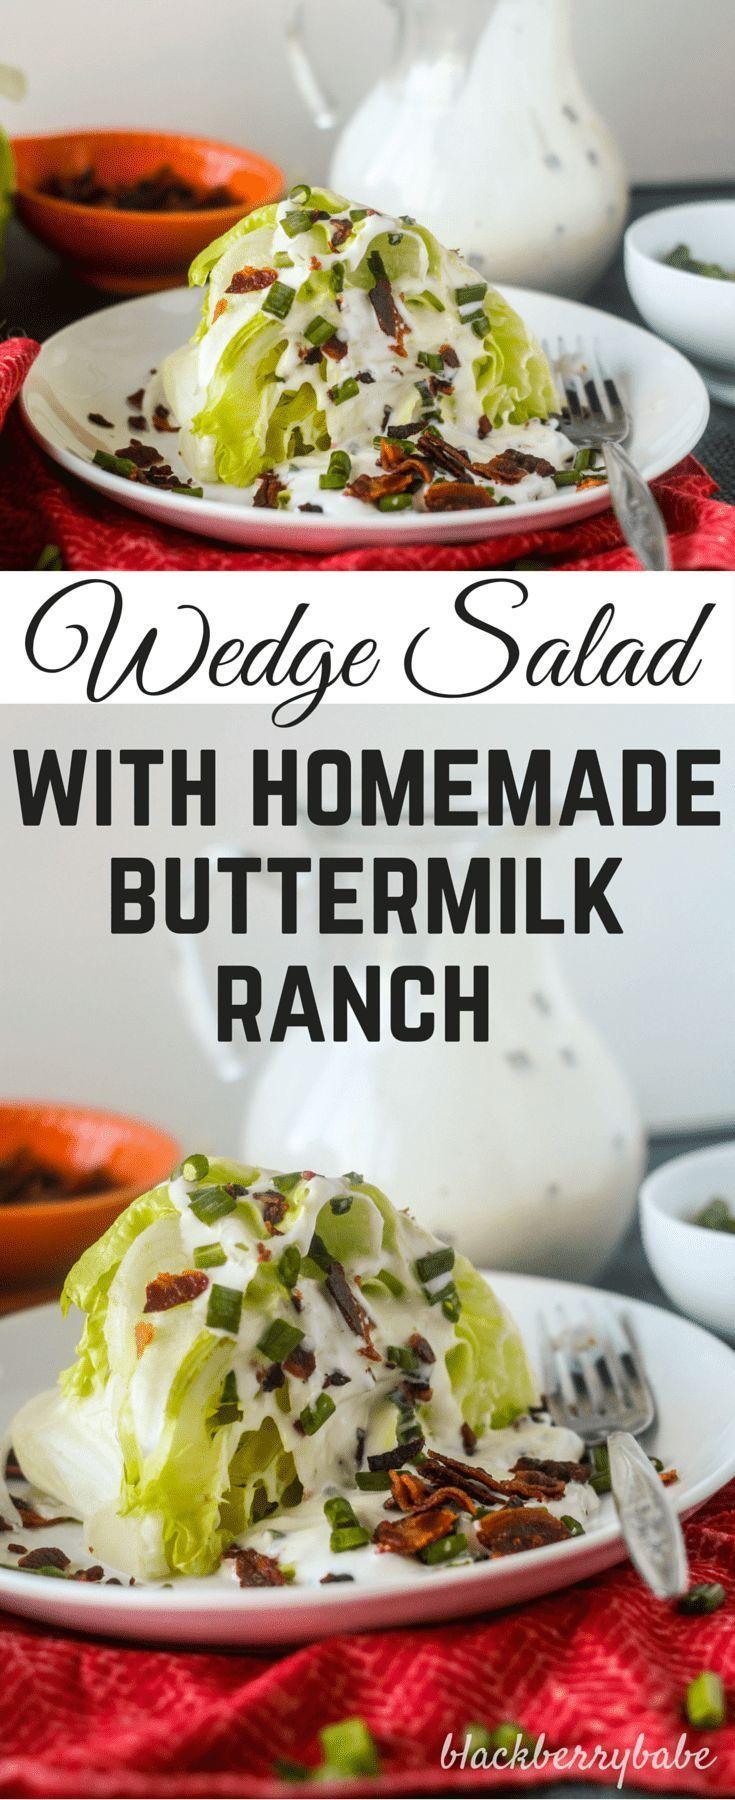 Wedge Salad Sandwiches - #salad #sandwiches #wedge - #ItalianSides